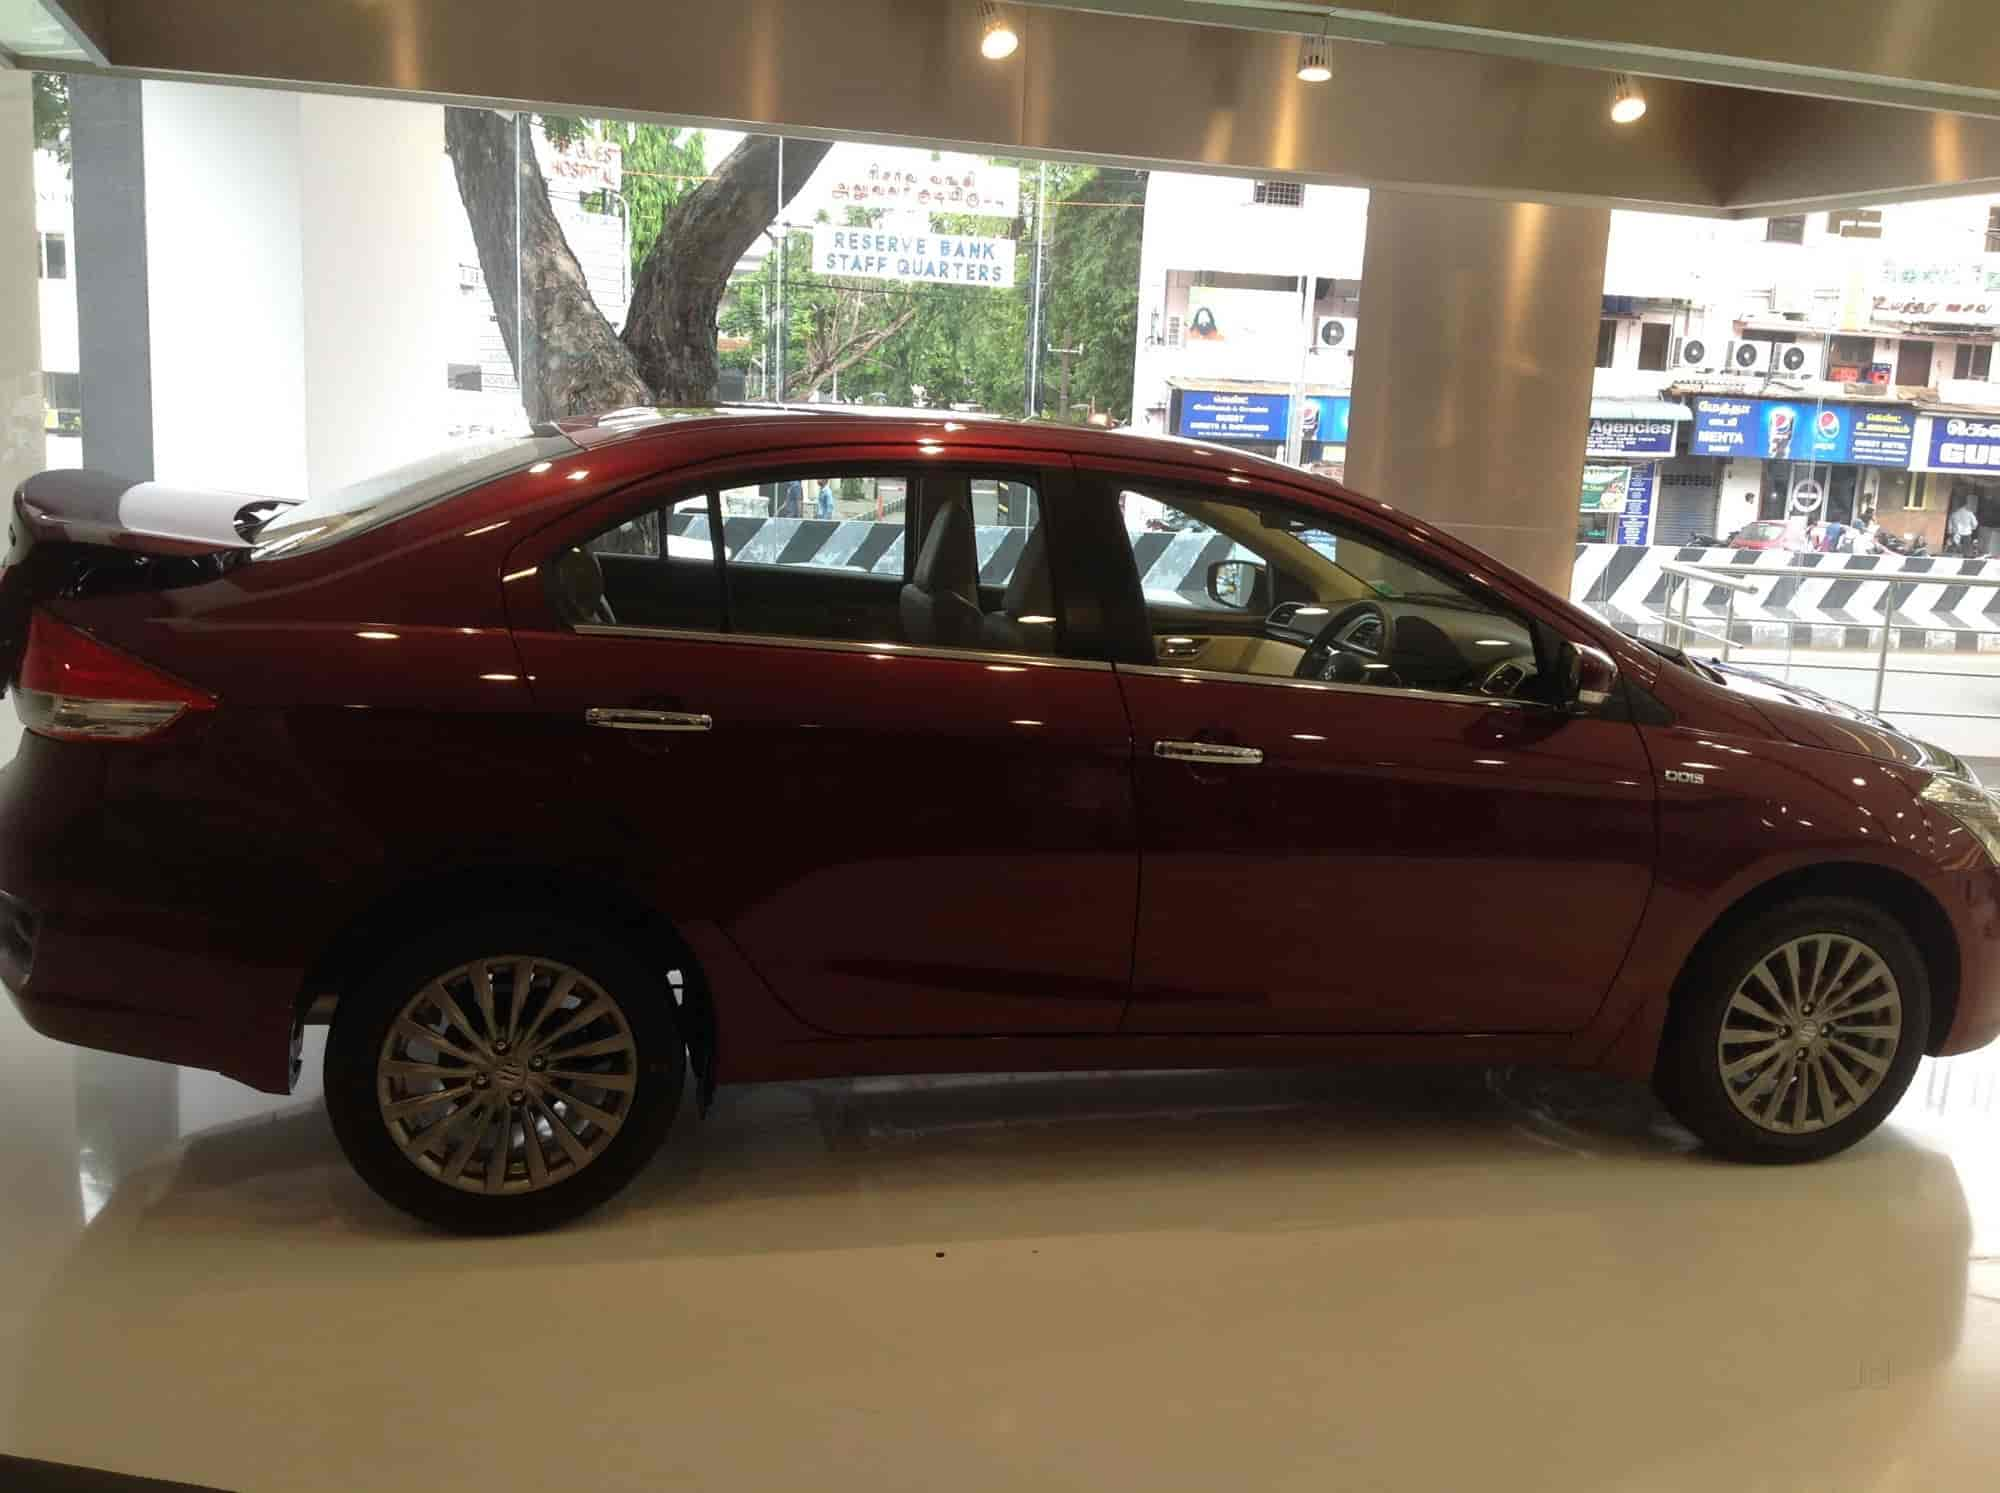 Nexa Maruti Suzuki, Ambattur Industrial Estate - Car Dealers-Maruti Suzuki  in Chennai - Justdial